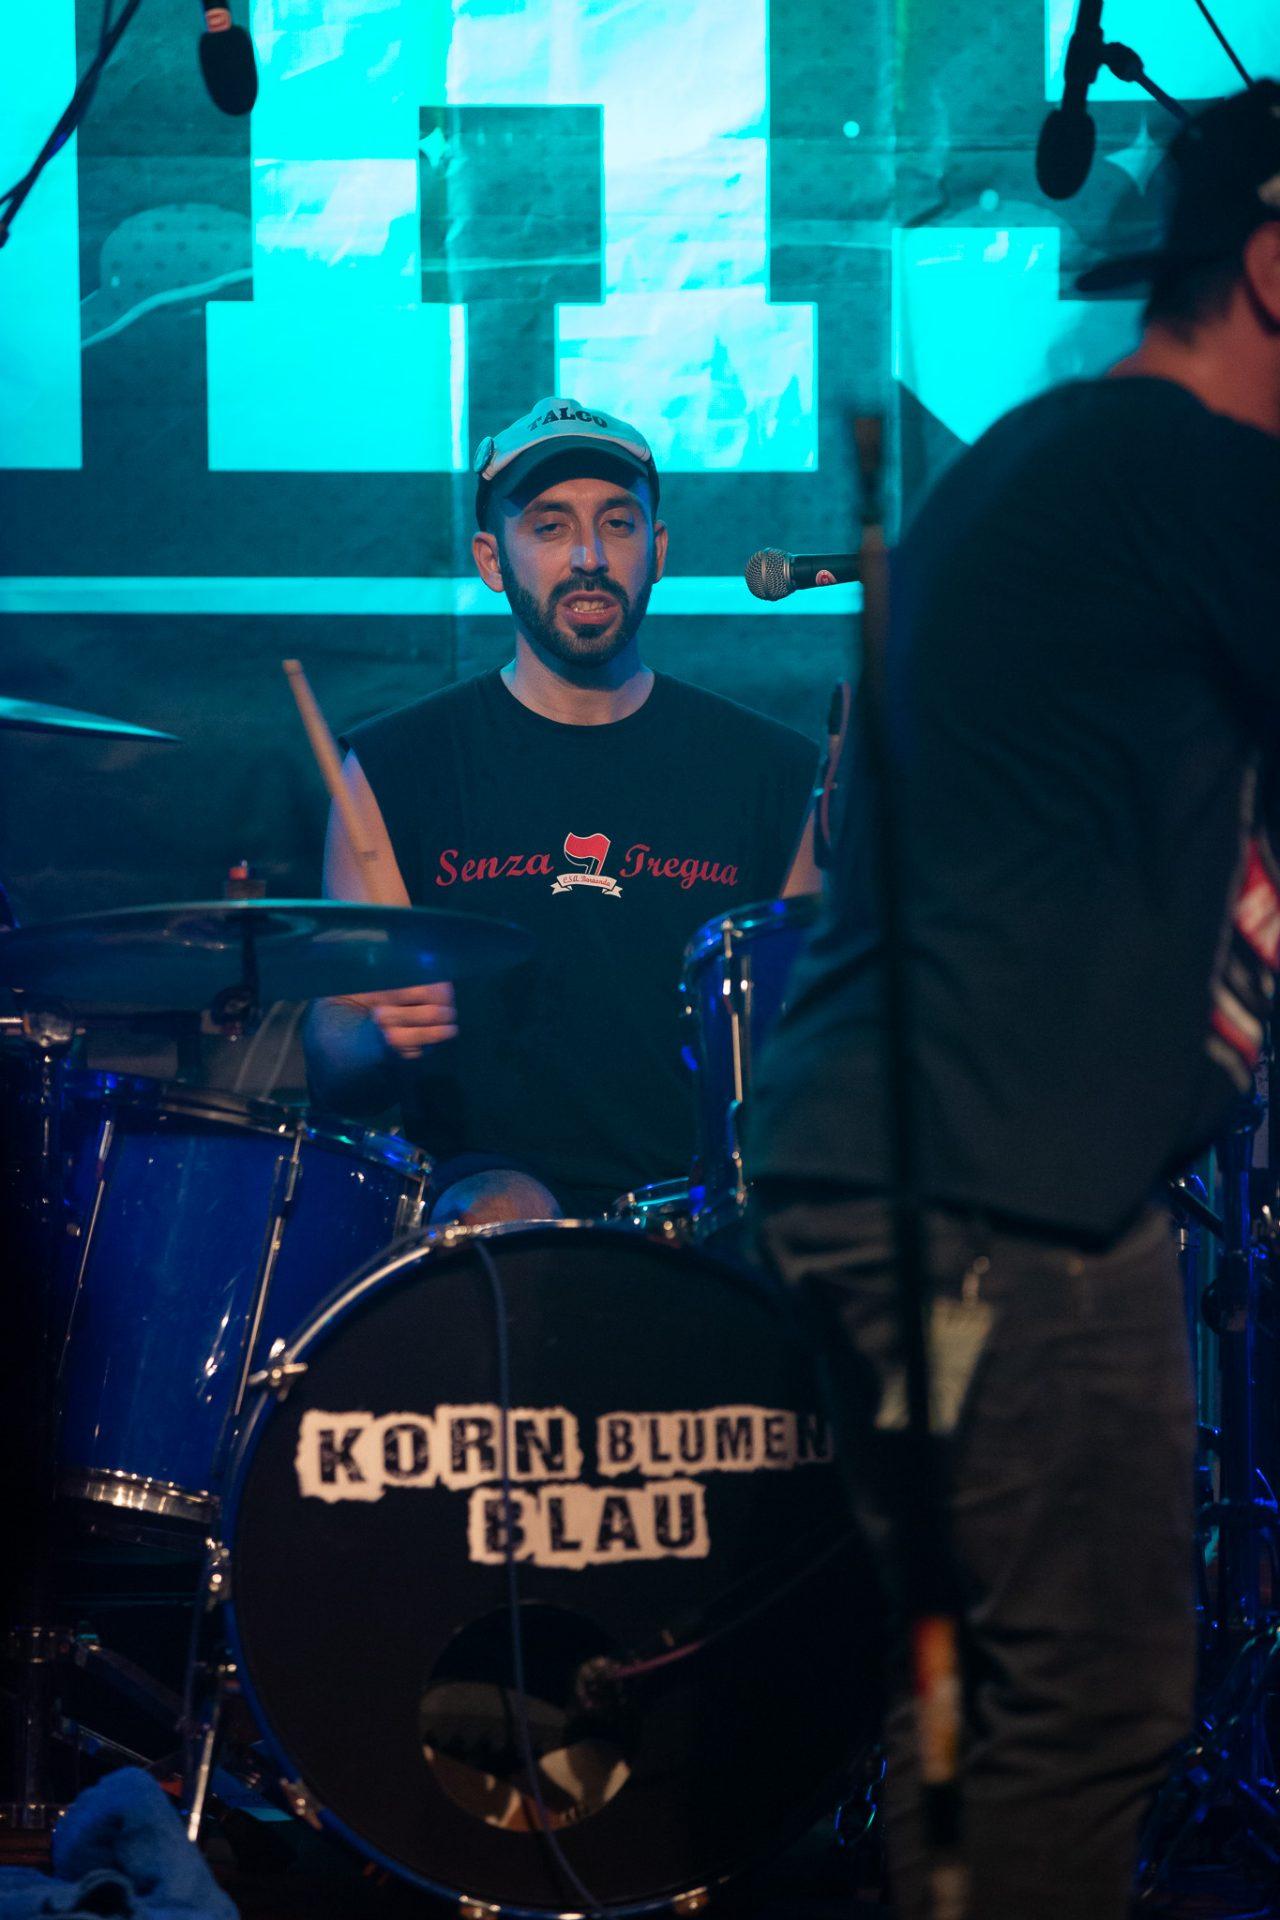 NH3 - Drummer